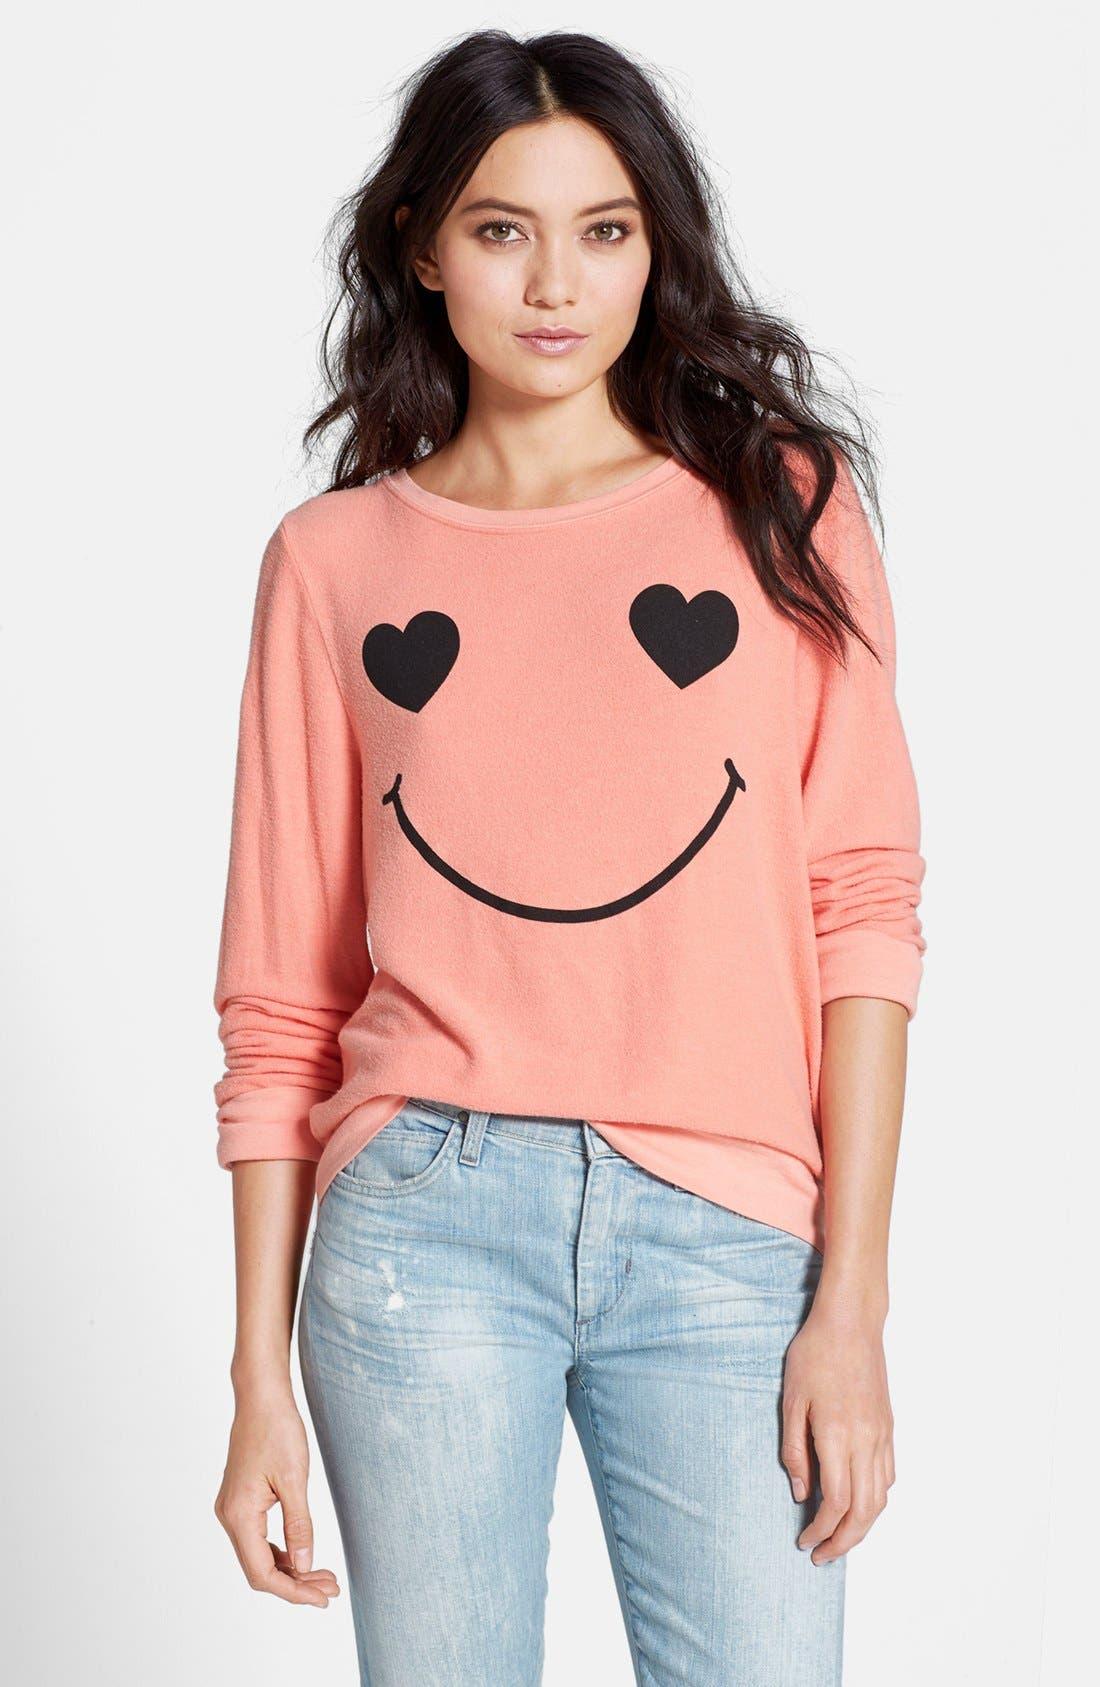 Main Image - Wildfox 'Happy Heart Face' Sweater